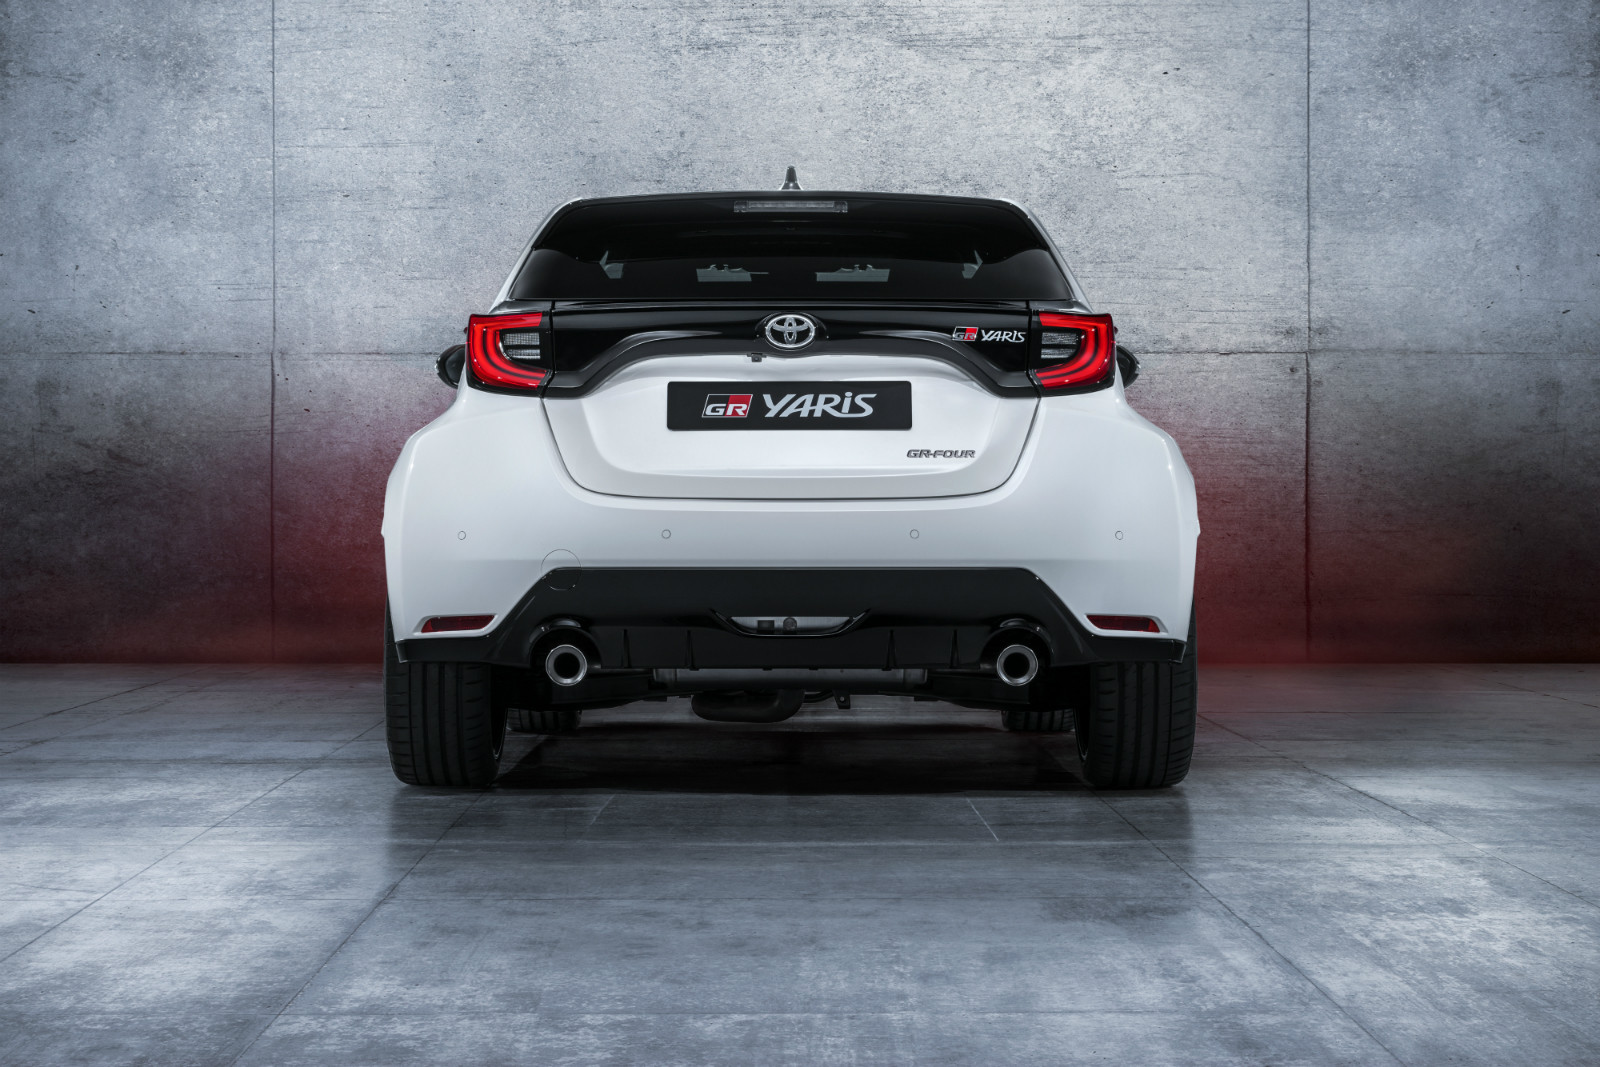 Toyota GR Yaris - Toyota GR Yaris